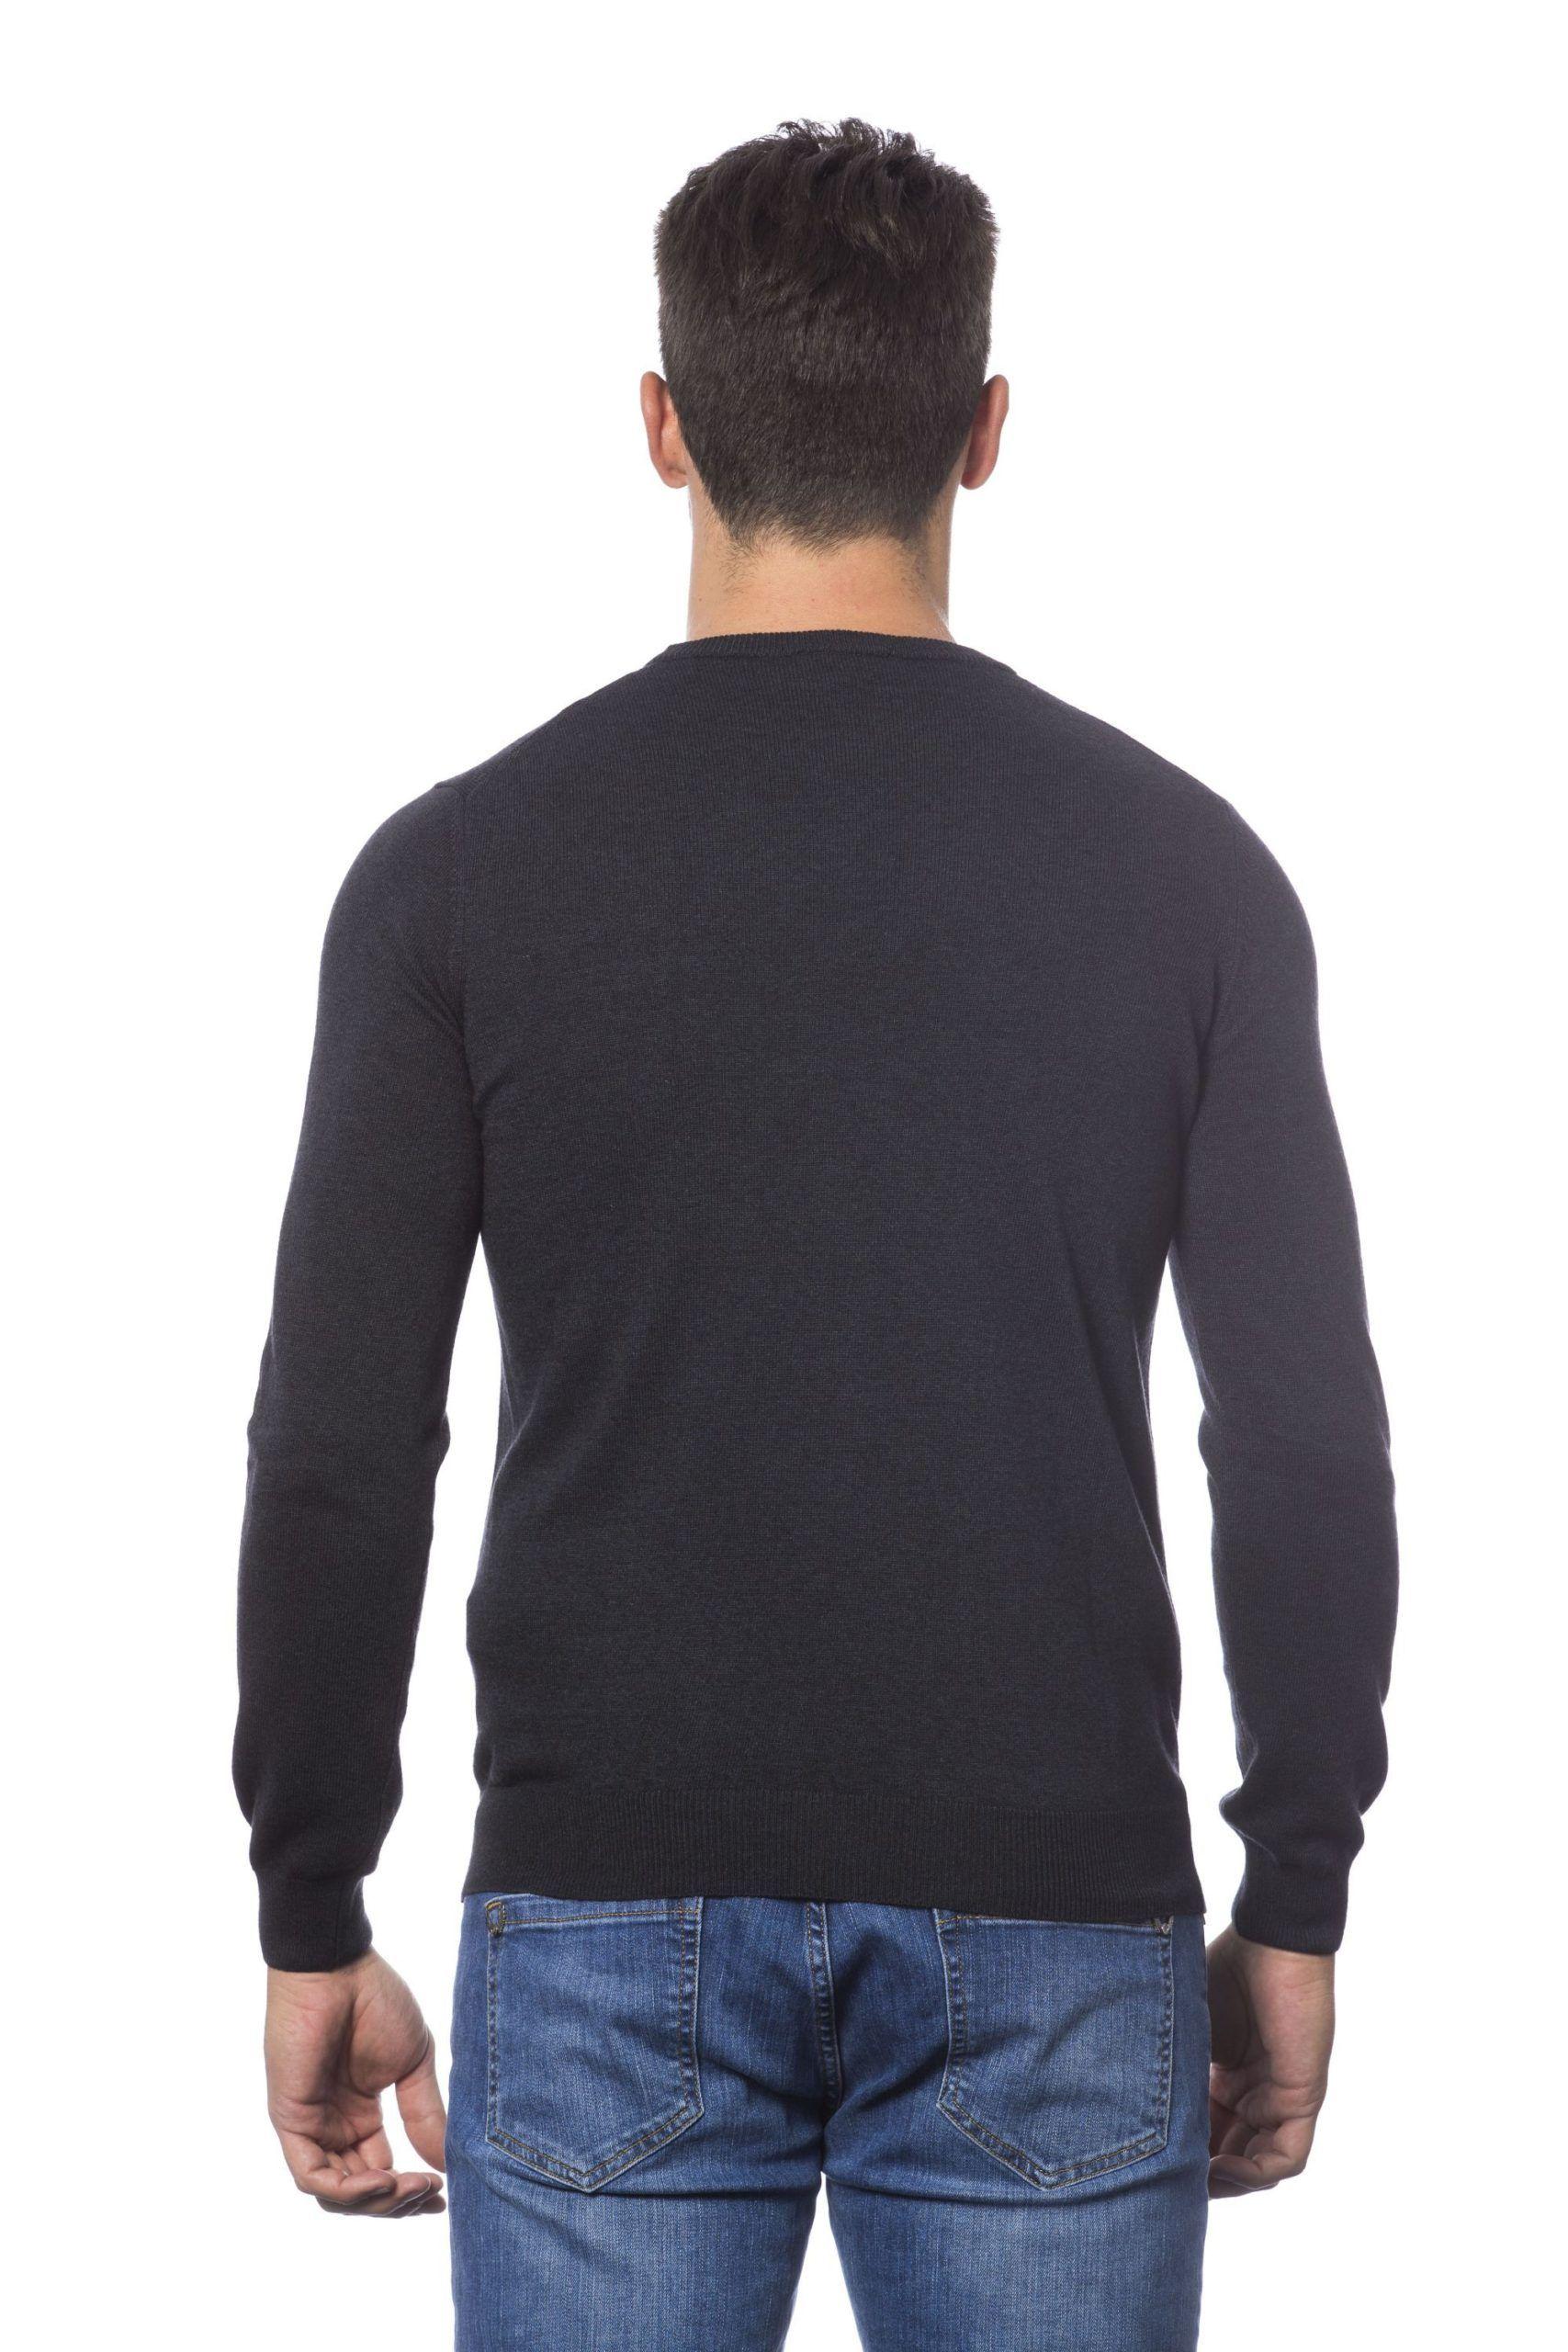 Roberto Cavalli Sport Antracite Sweater